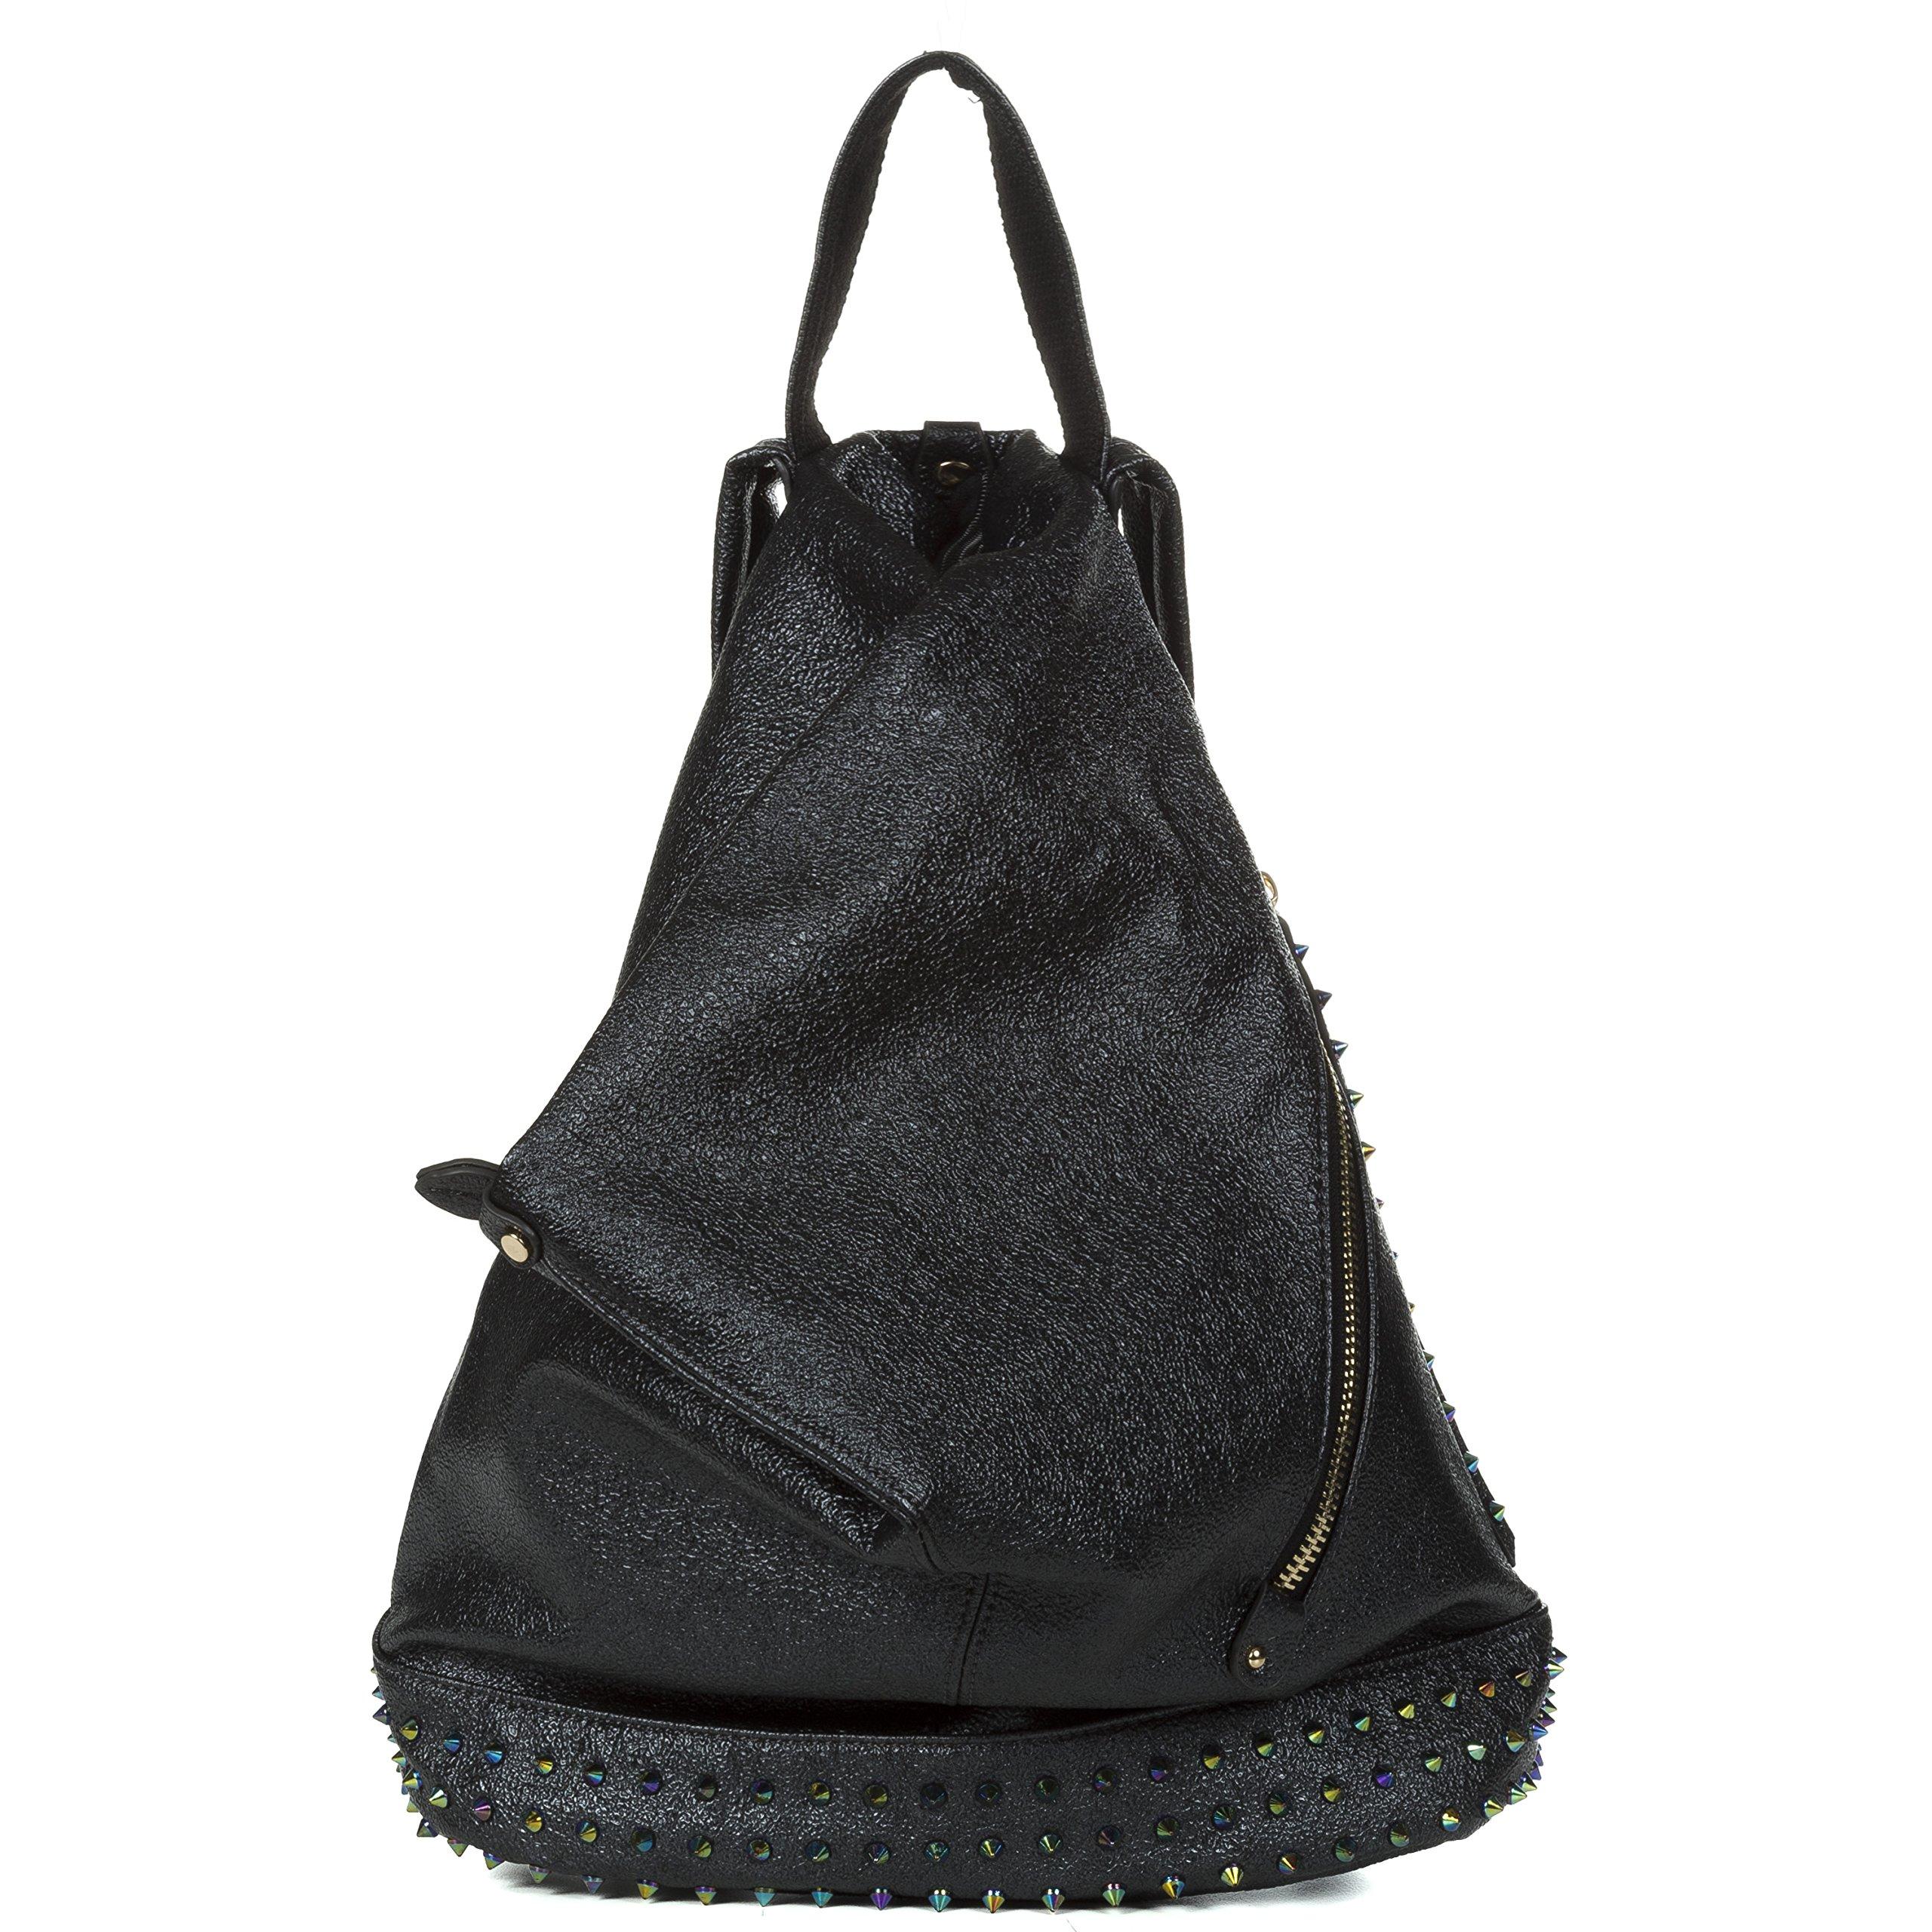 Handbag Republic Fashion Backpack Vegan Leather Travel Bag Easy Carry For Women